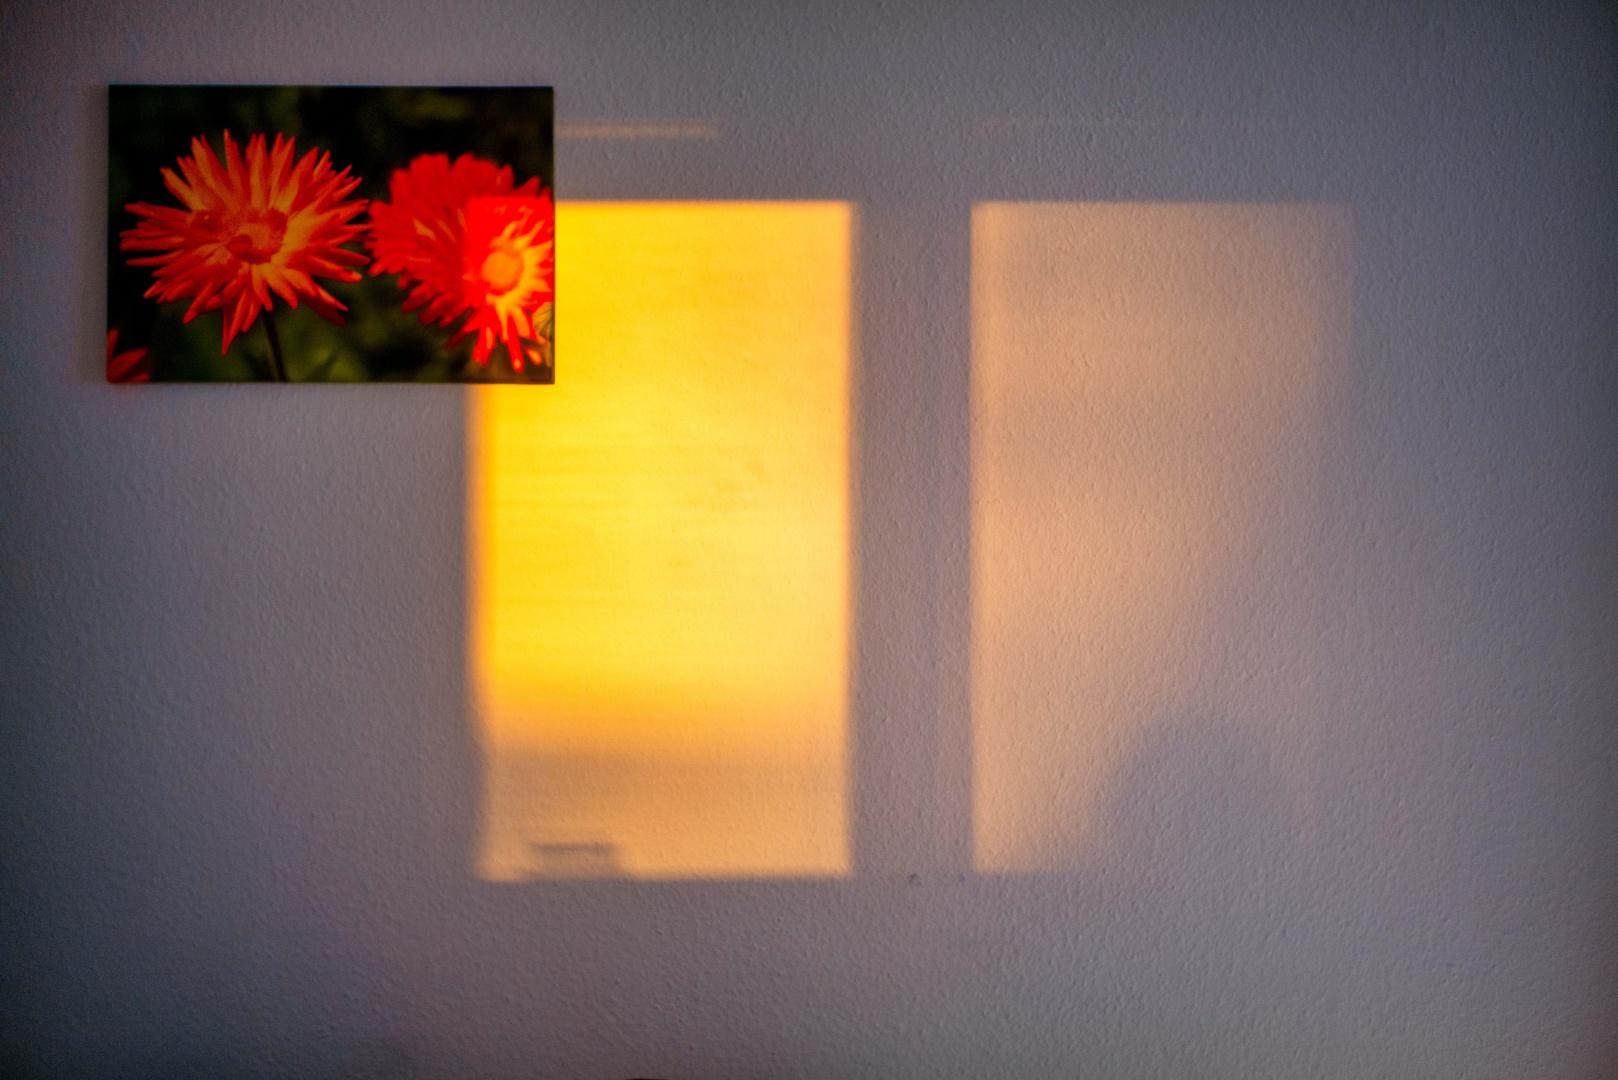 Sonnenuntergangreflexionschatten